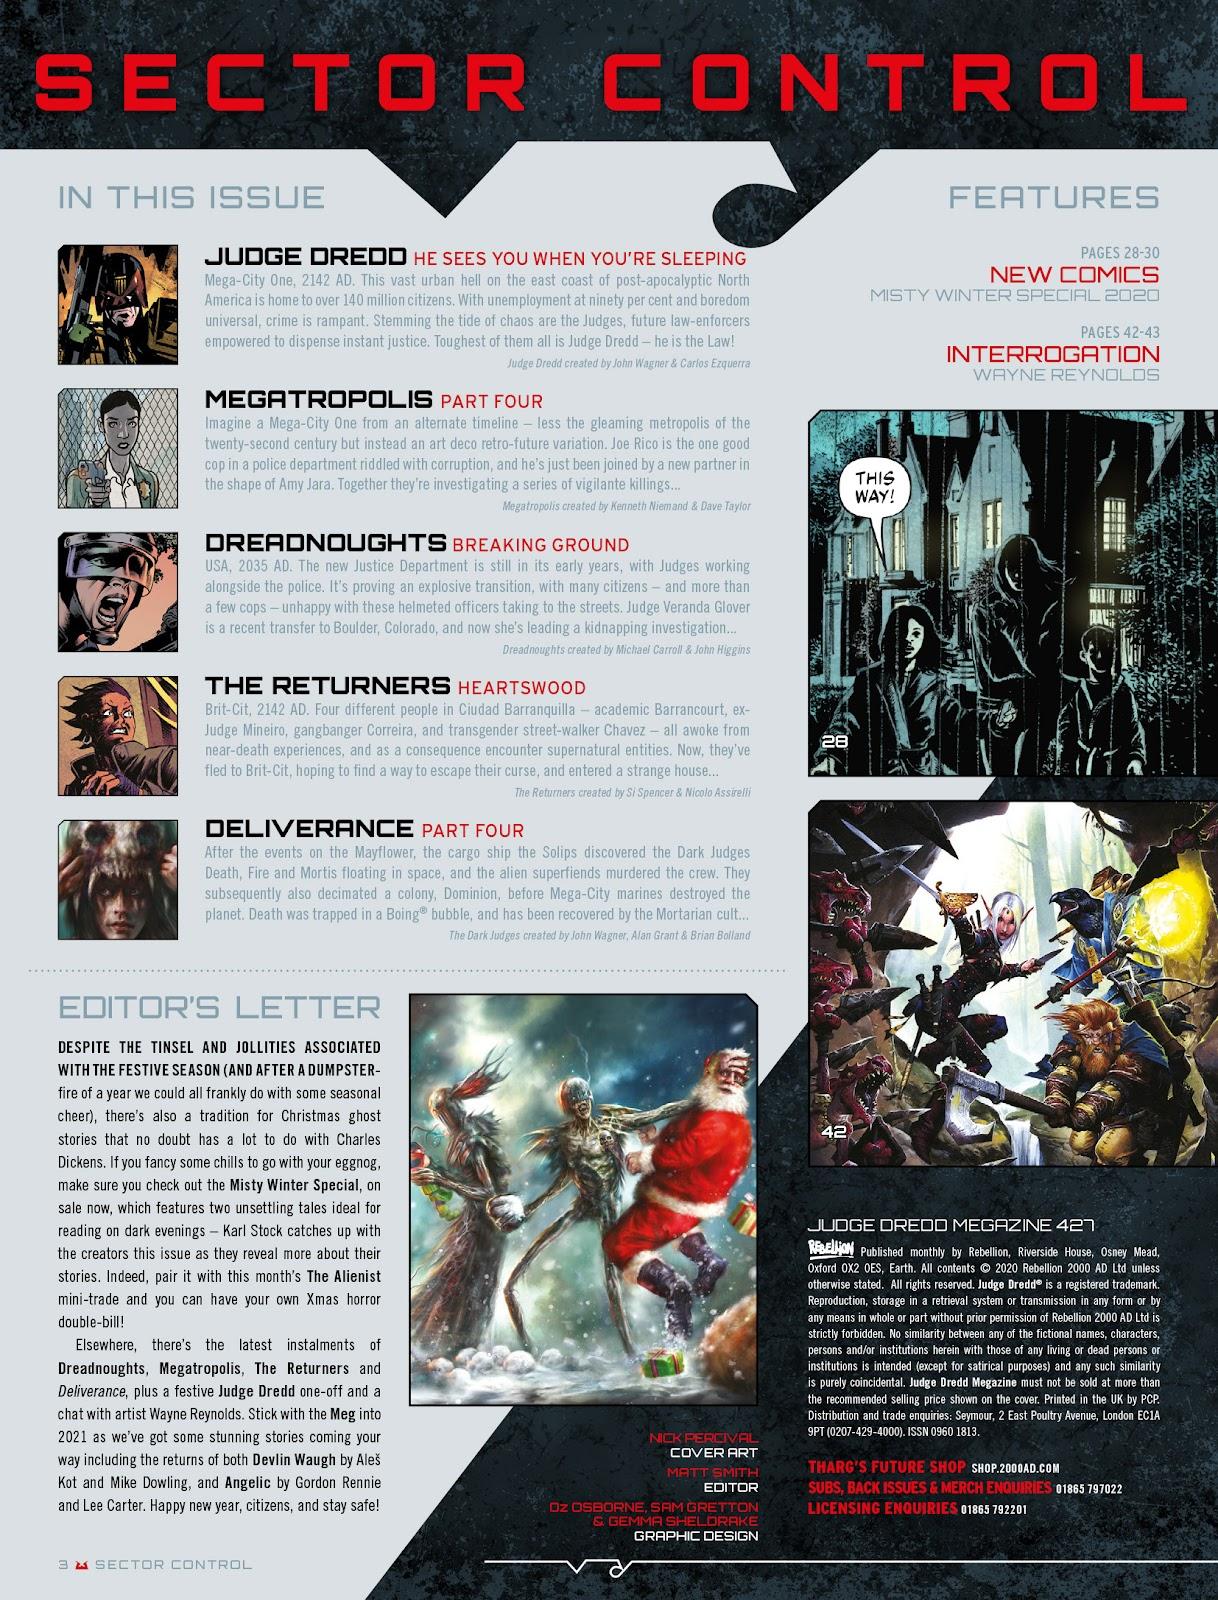 Judge Dredd Megazine (Vol. 5) issue 427 - Page 3